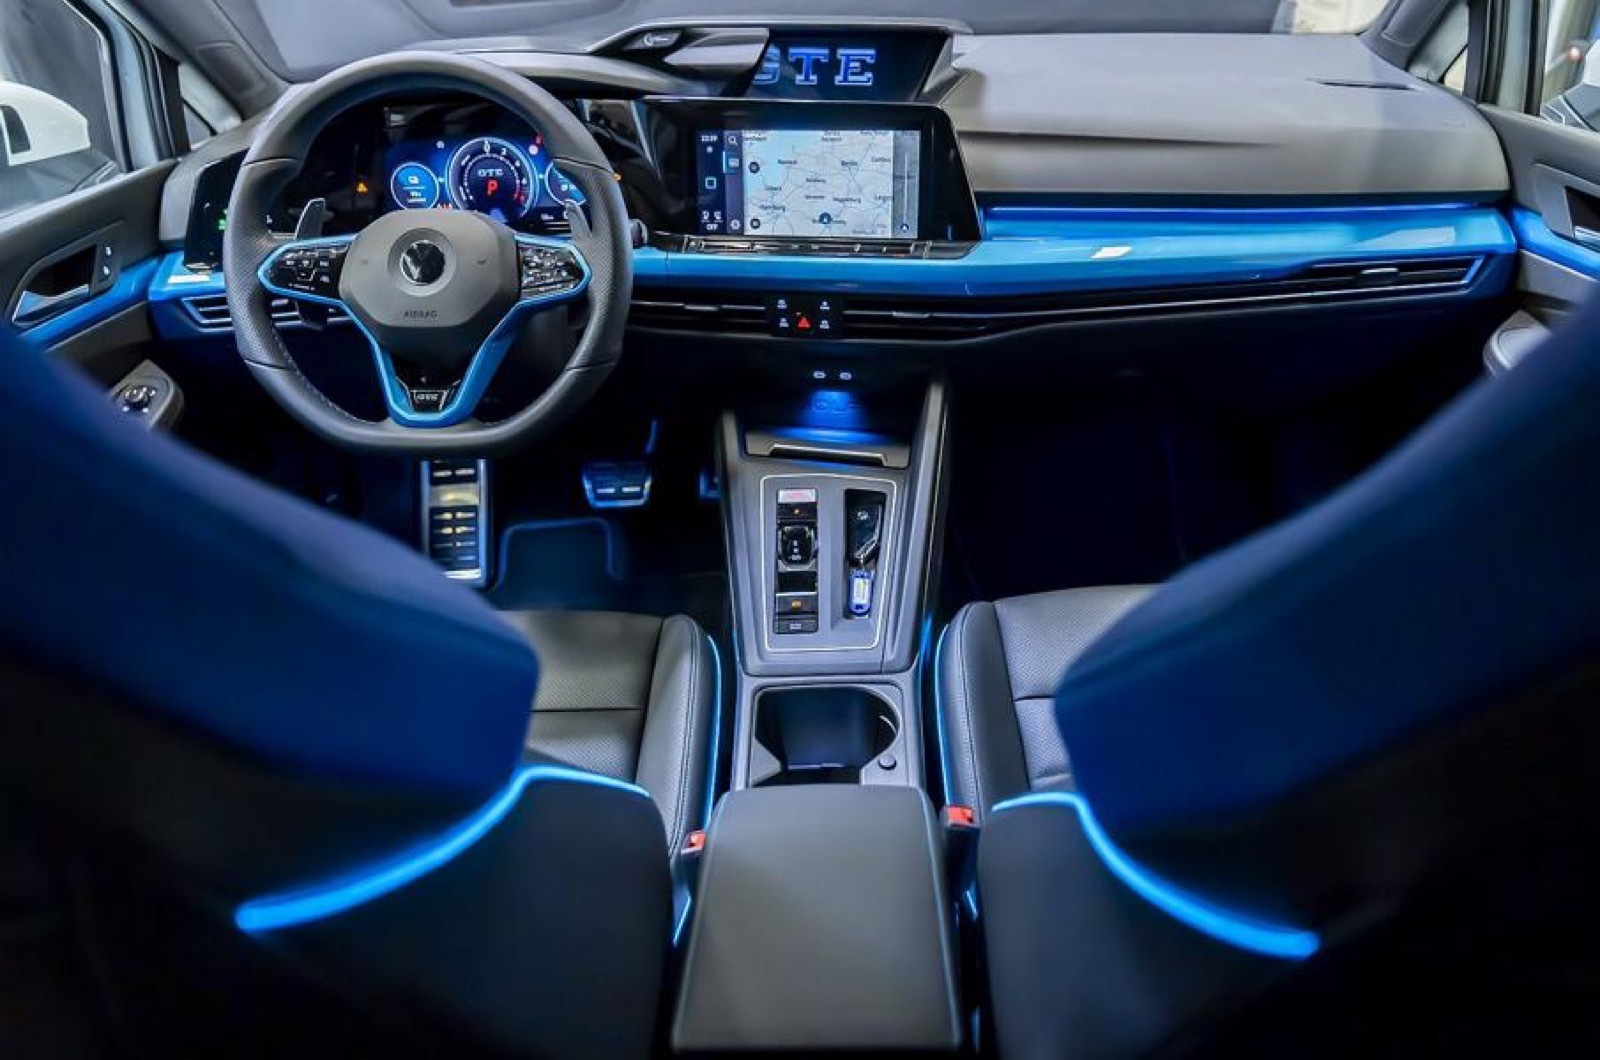 Volkswagen_Golf_GTE_Skylight-0001